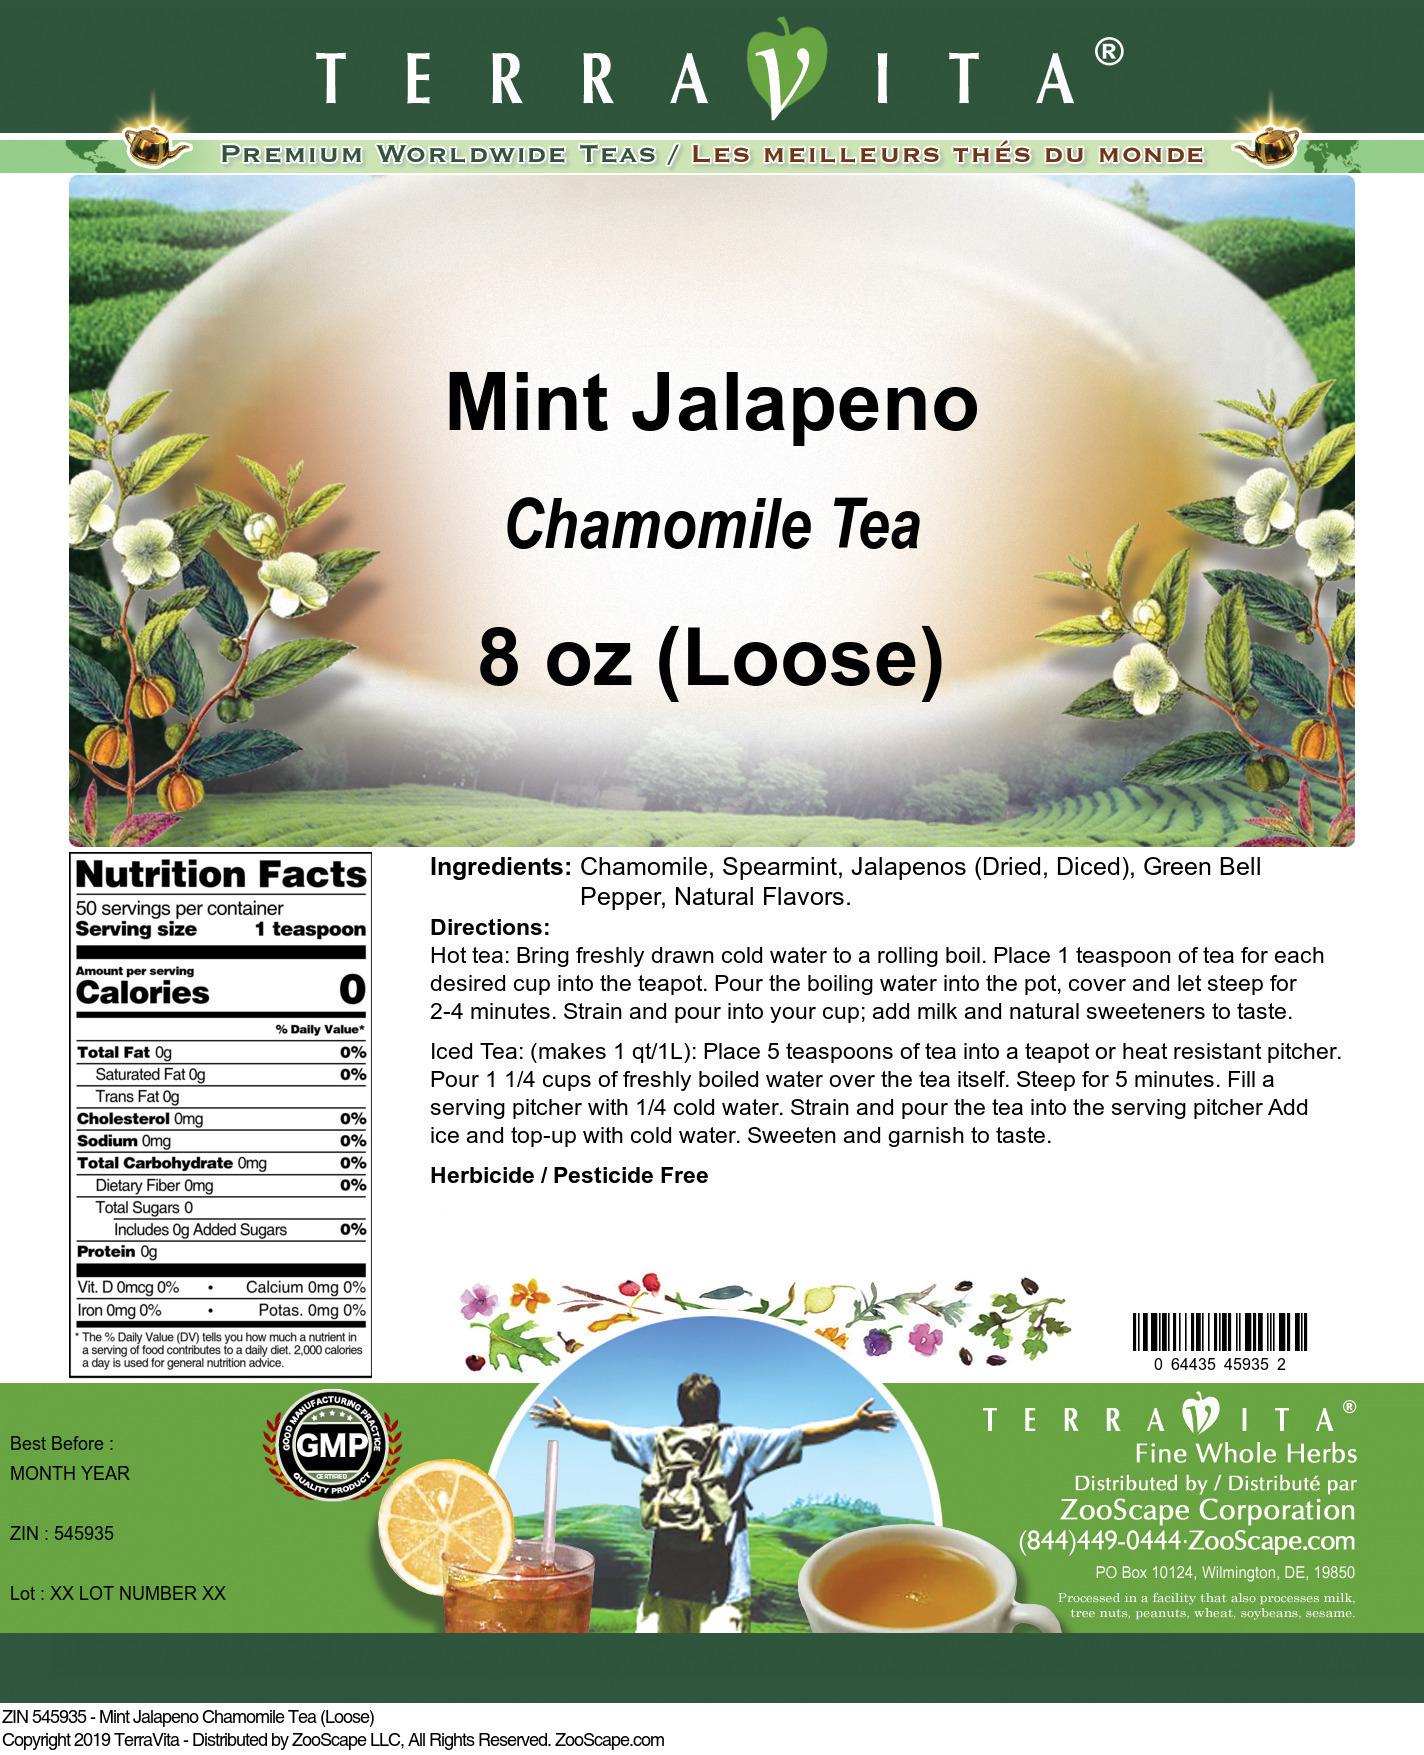 Mint Jalapeno Chamomile Tea